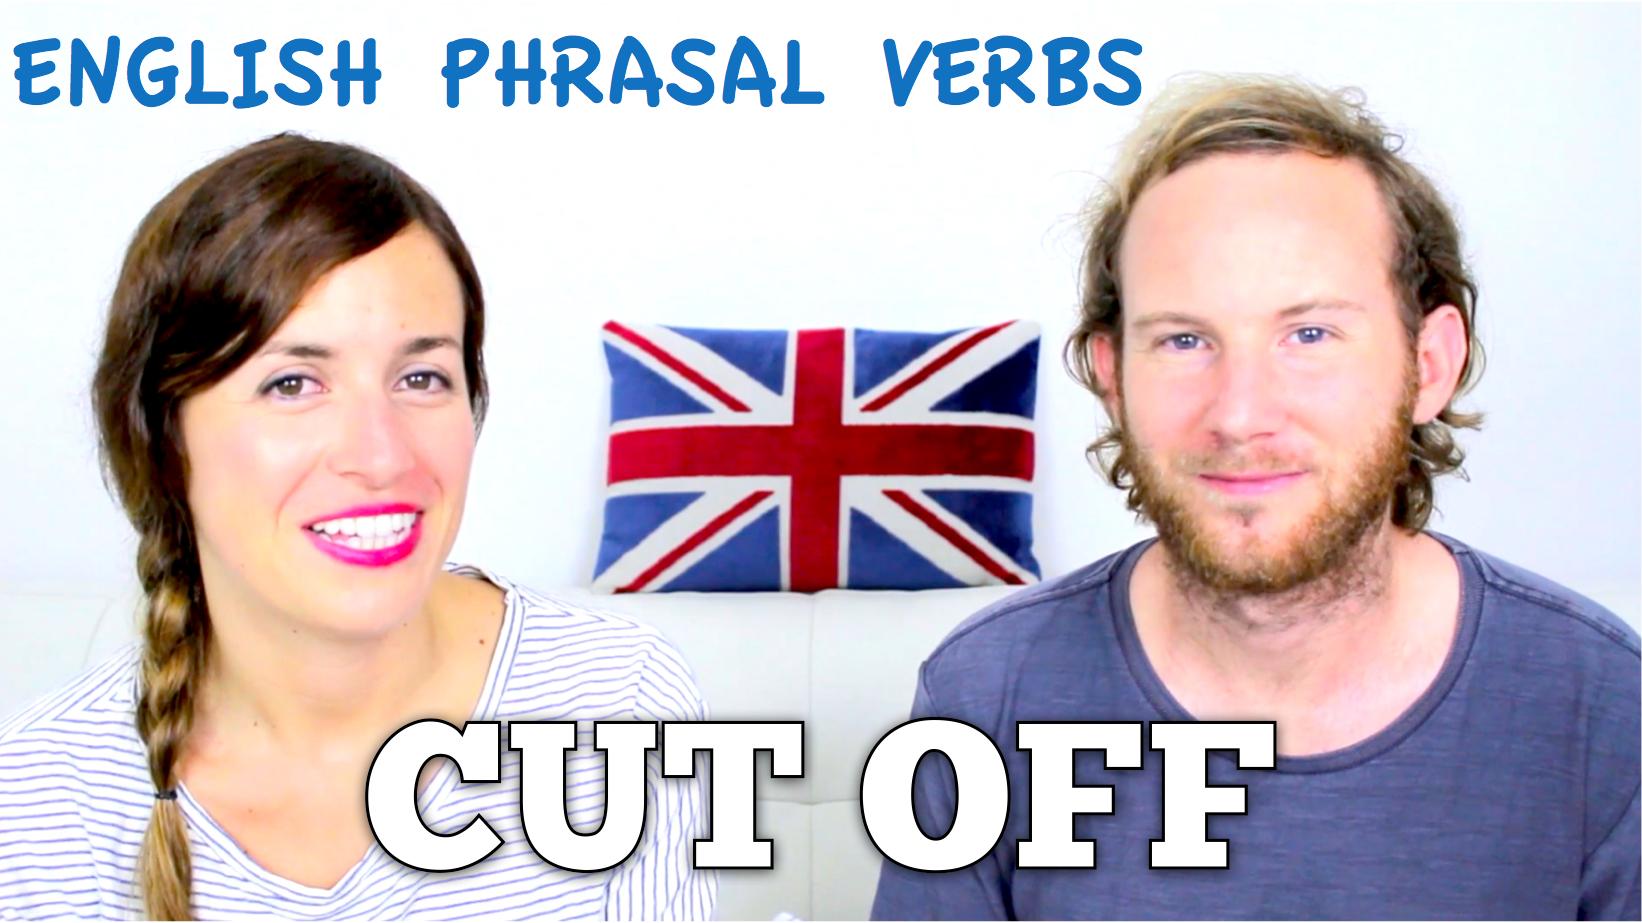 CUT OFF – English Phrasal Verbs